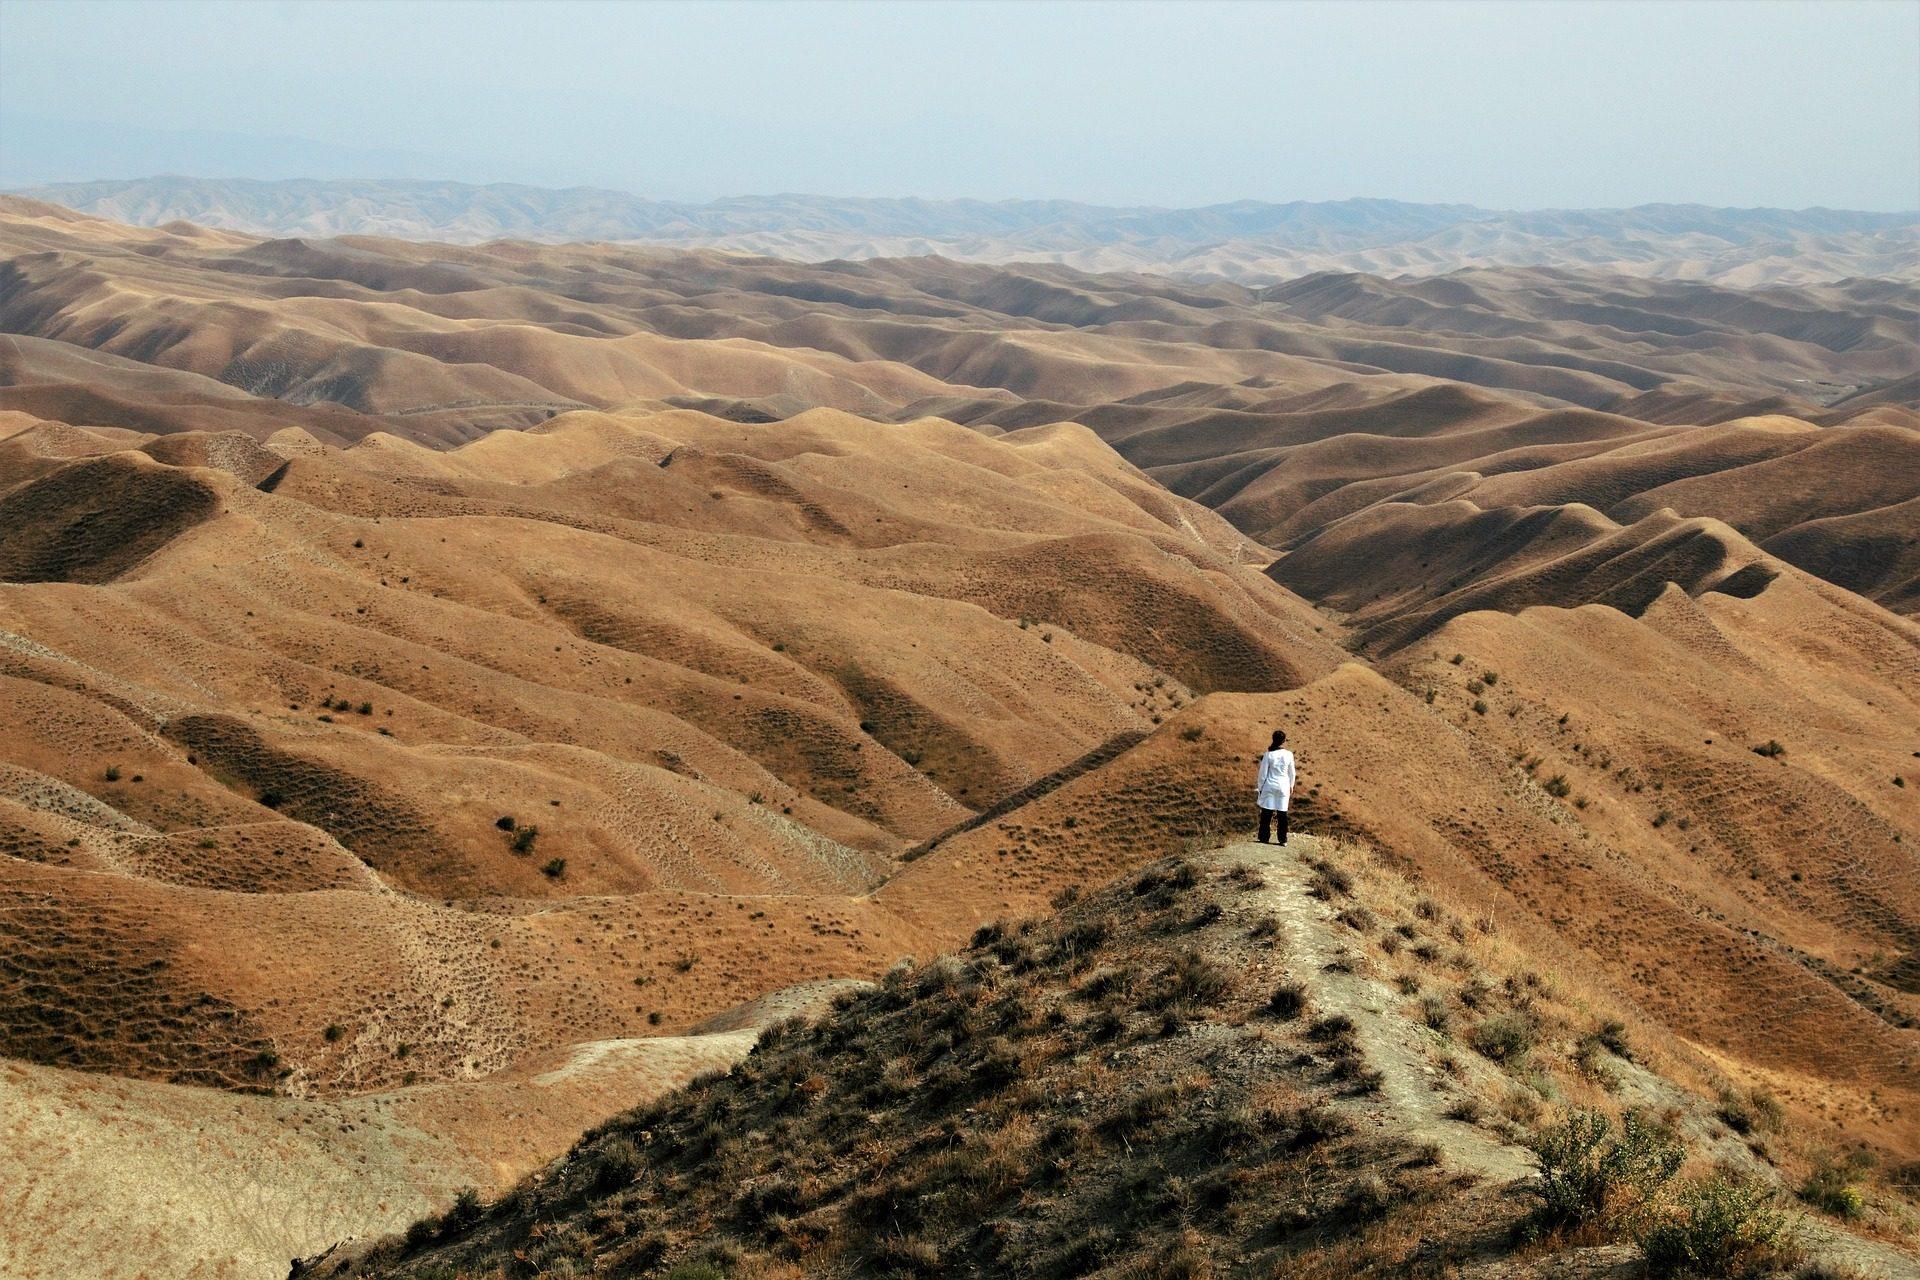 désert, dunes, sable, homme, Nabi khaled, Iran - Fonds d'écran HD - Professor-falken.com